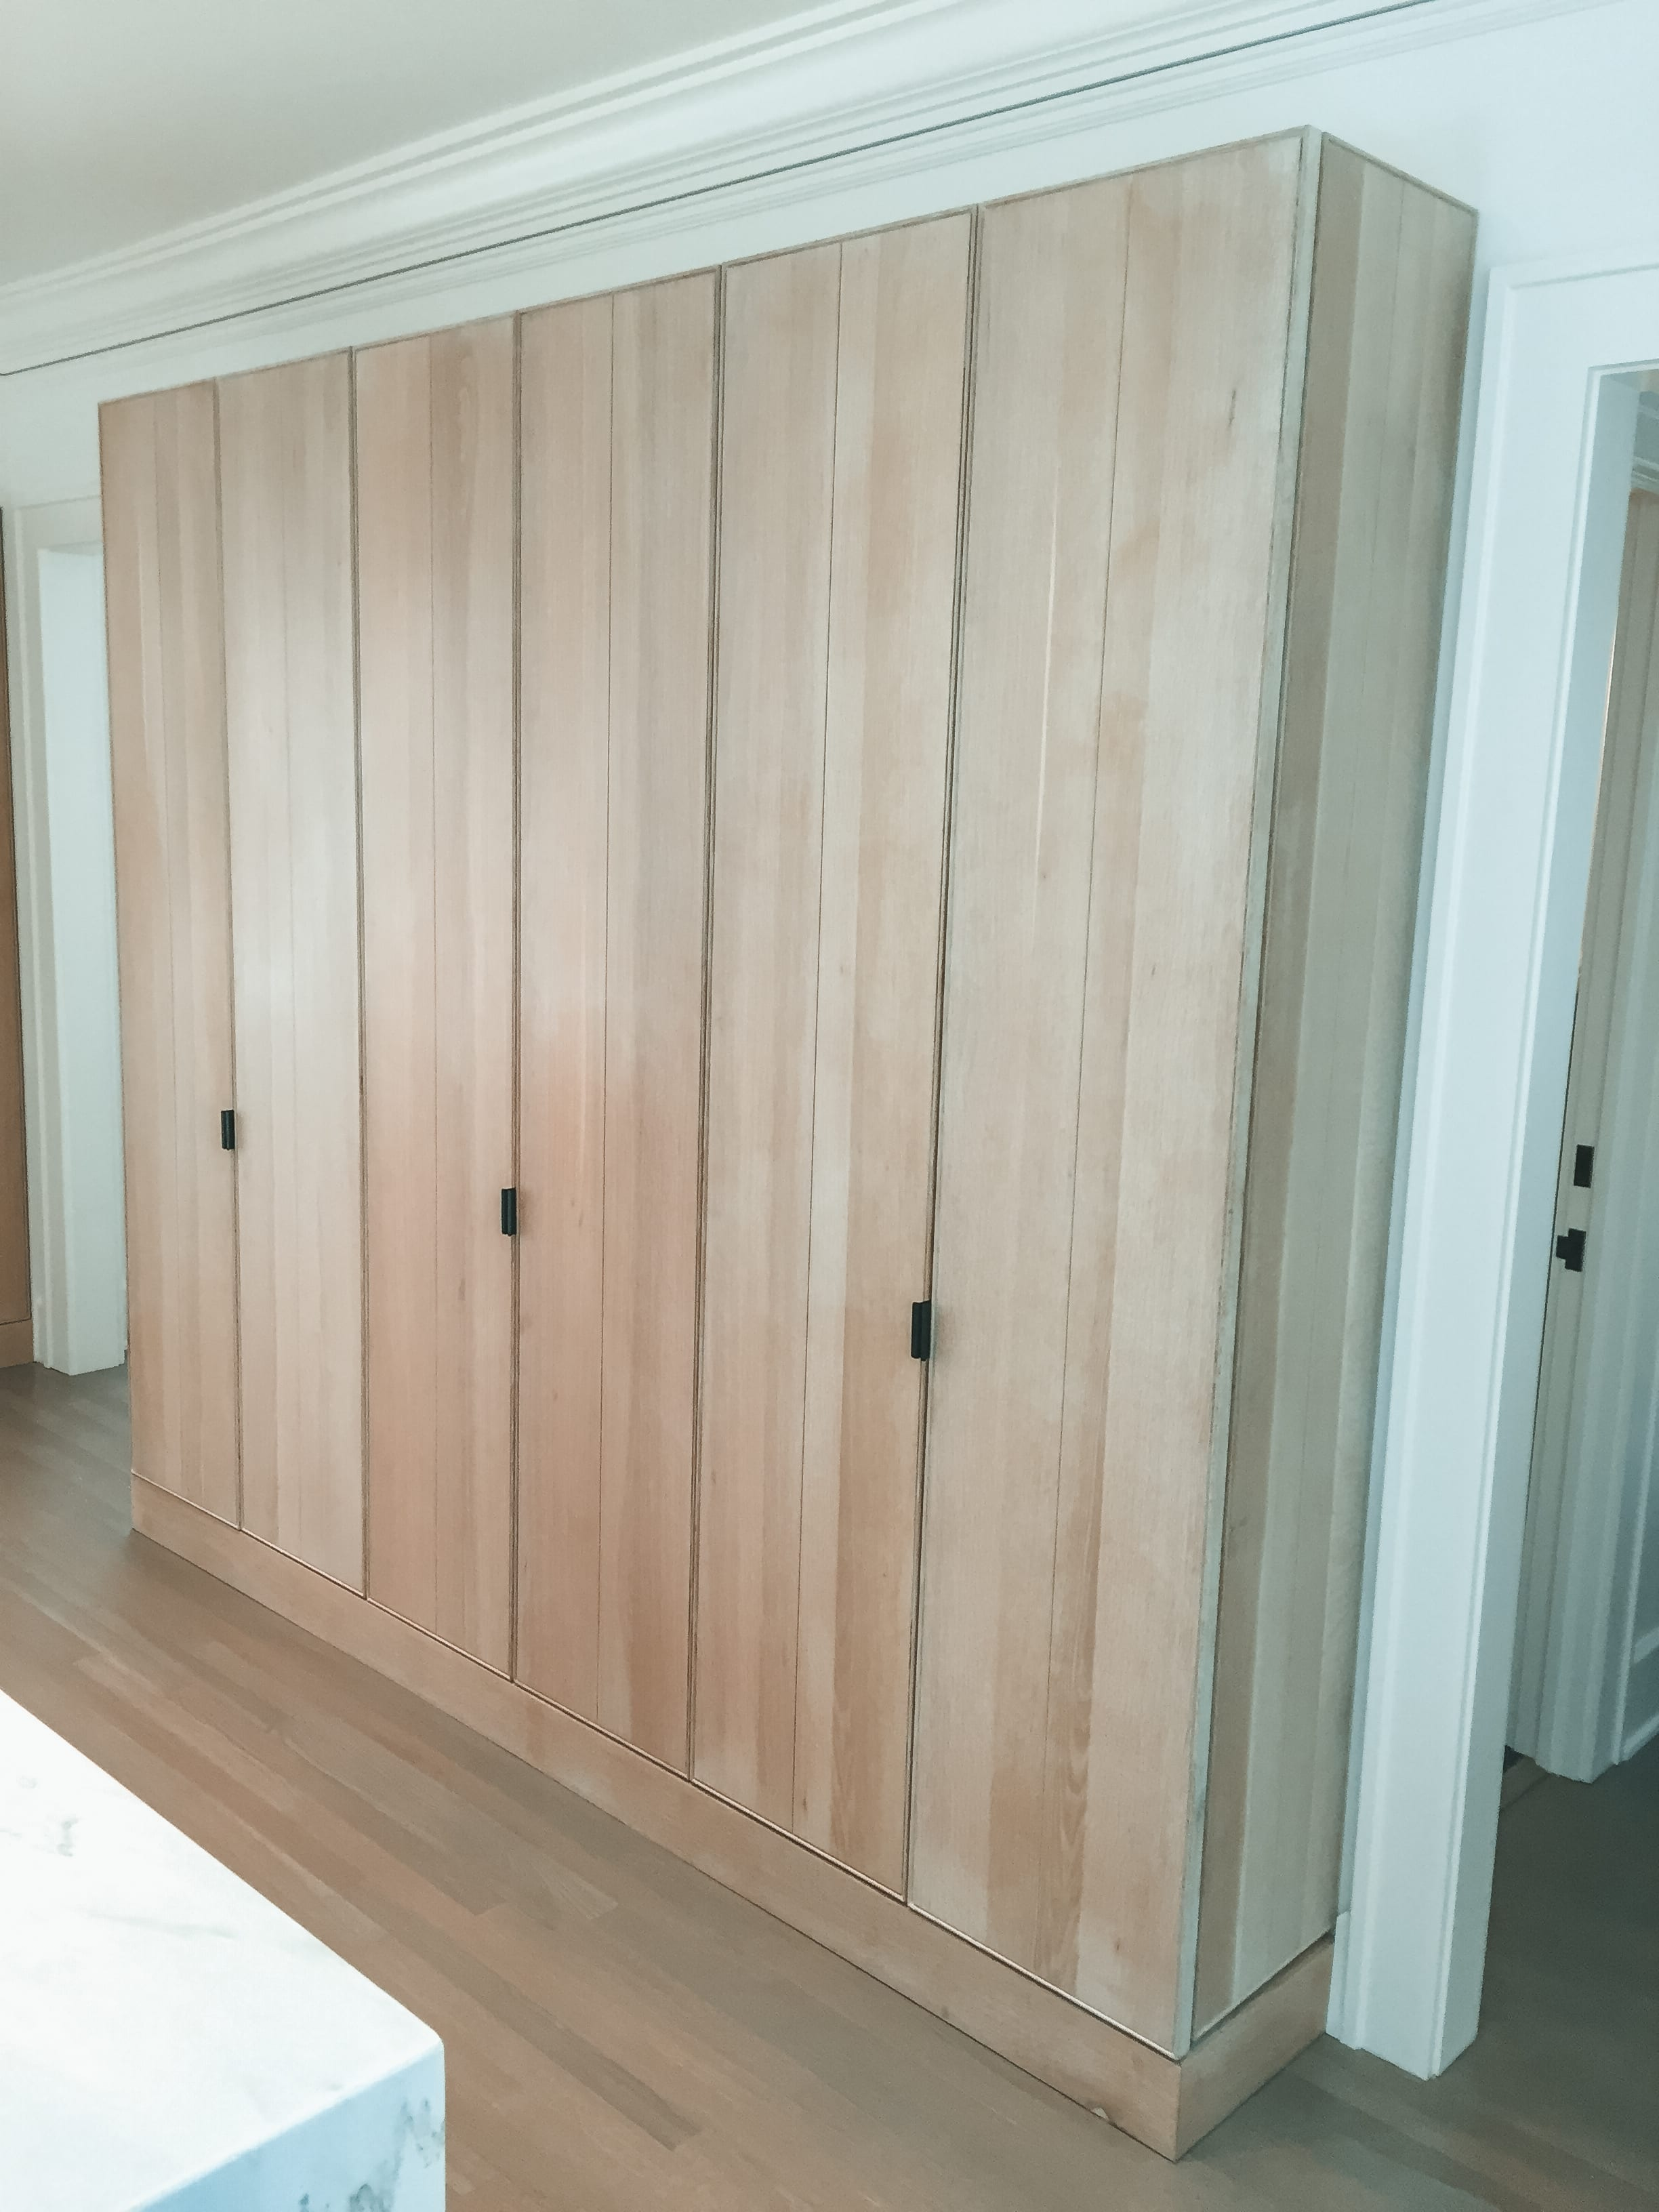 Simple White Oak Kitchen Storage Cabinets